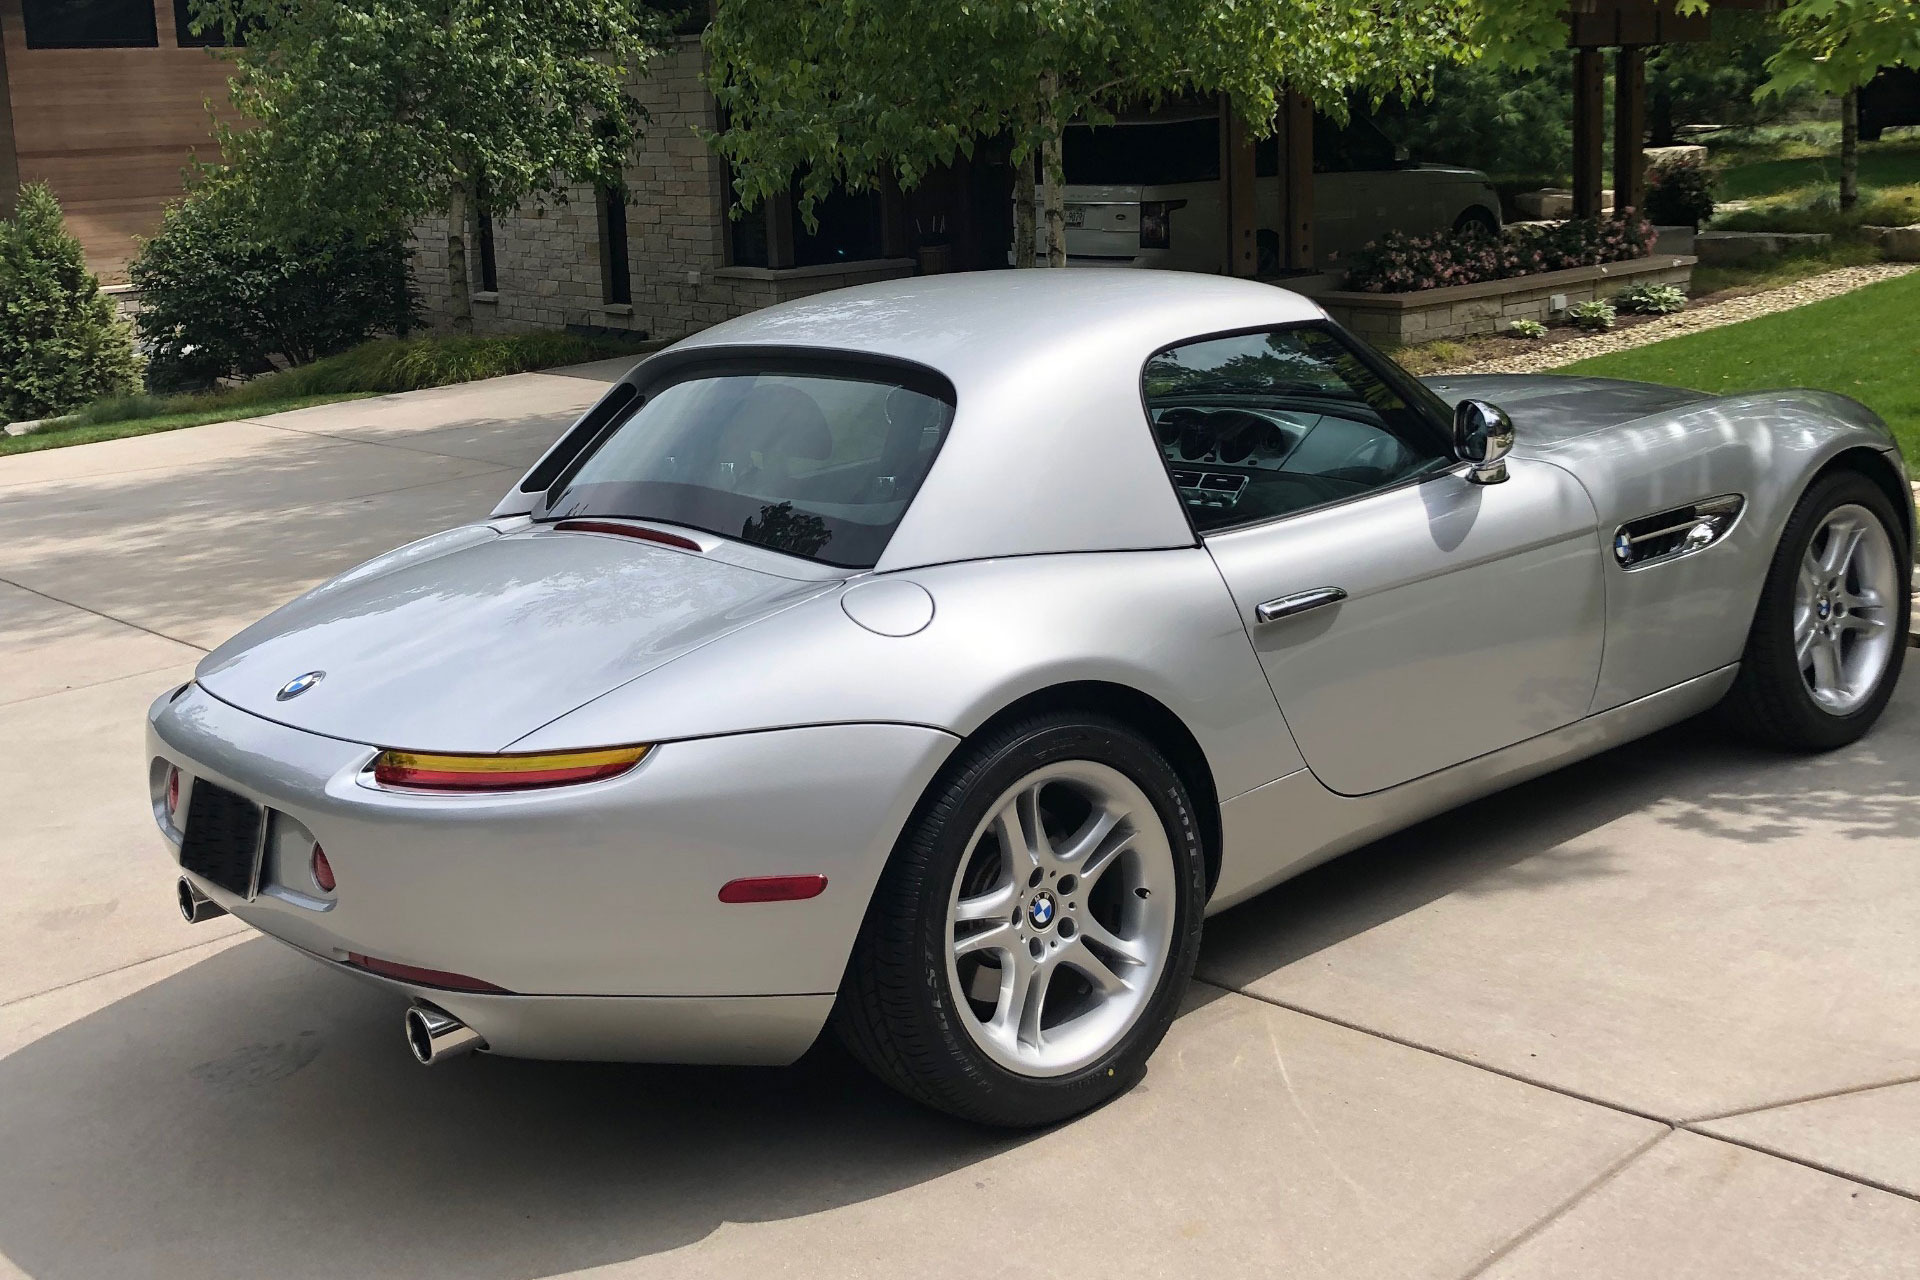 Used 2000 BMW Z8 BASE | Chicago, IL